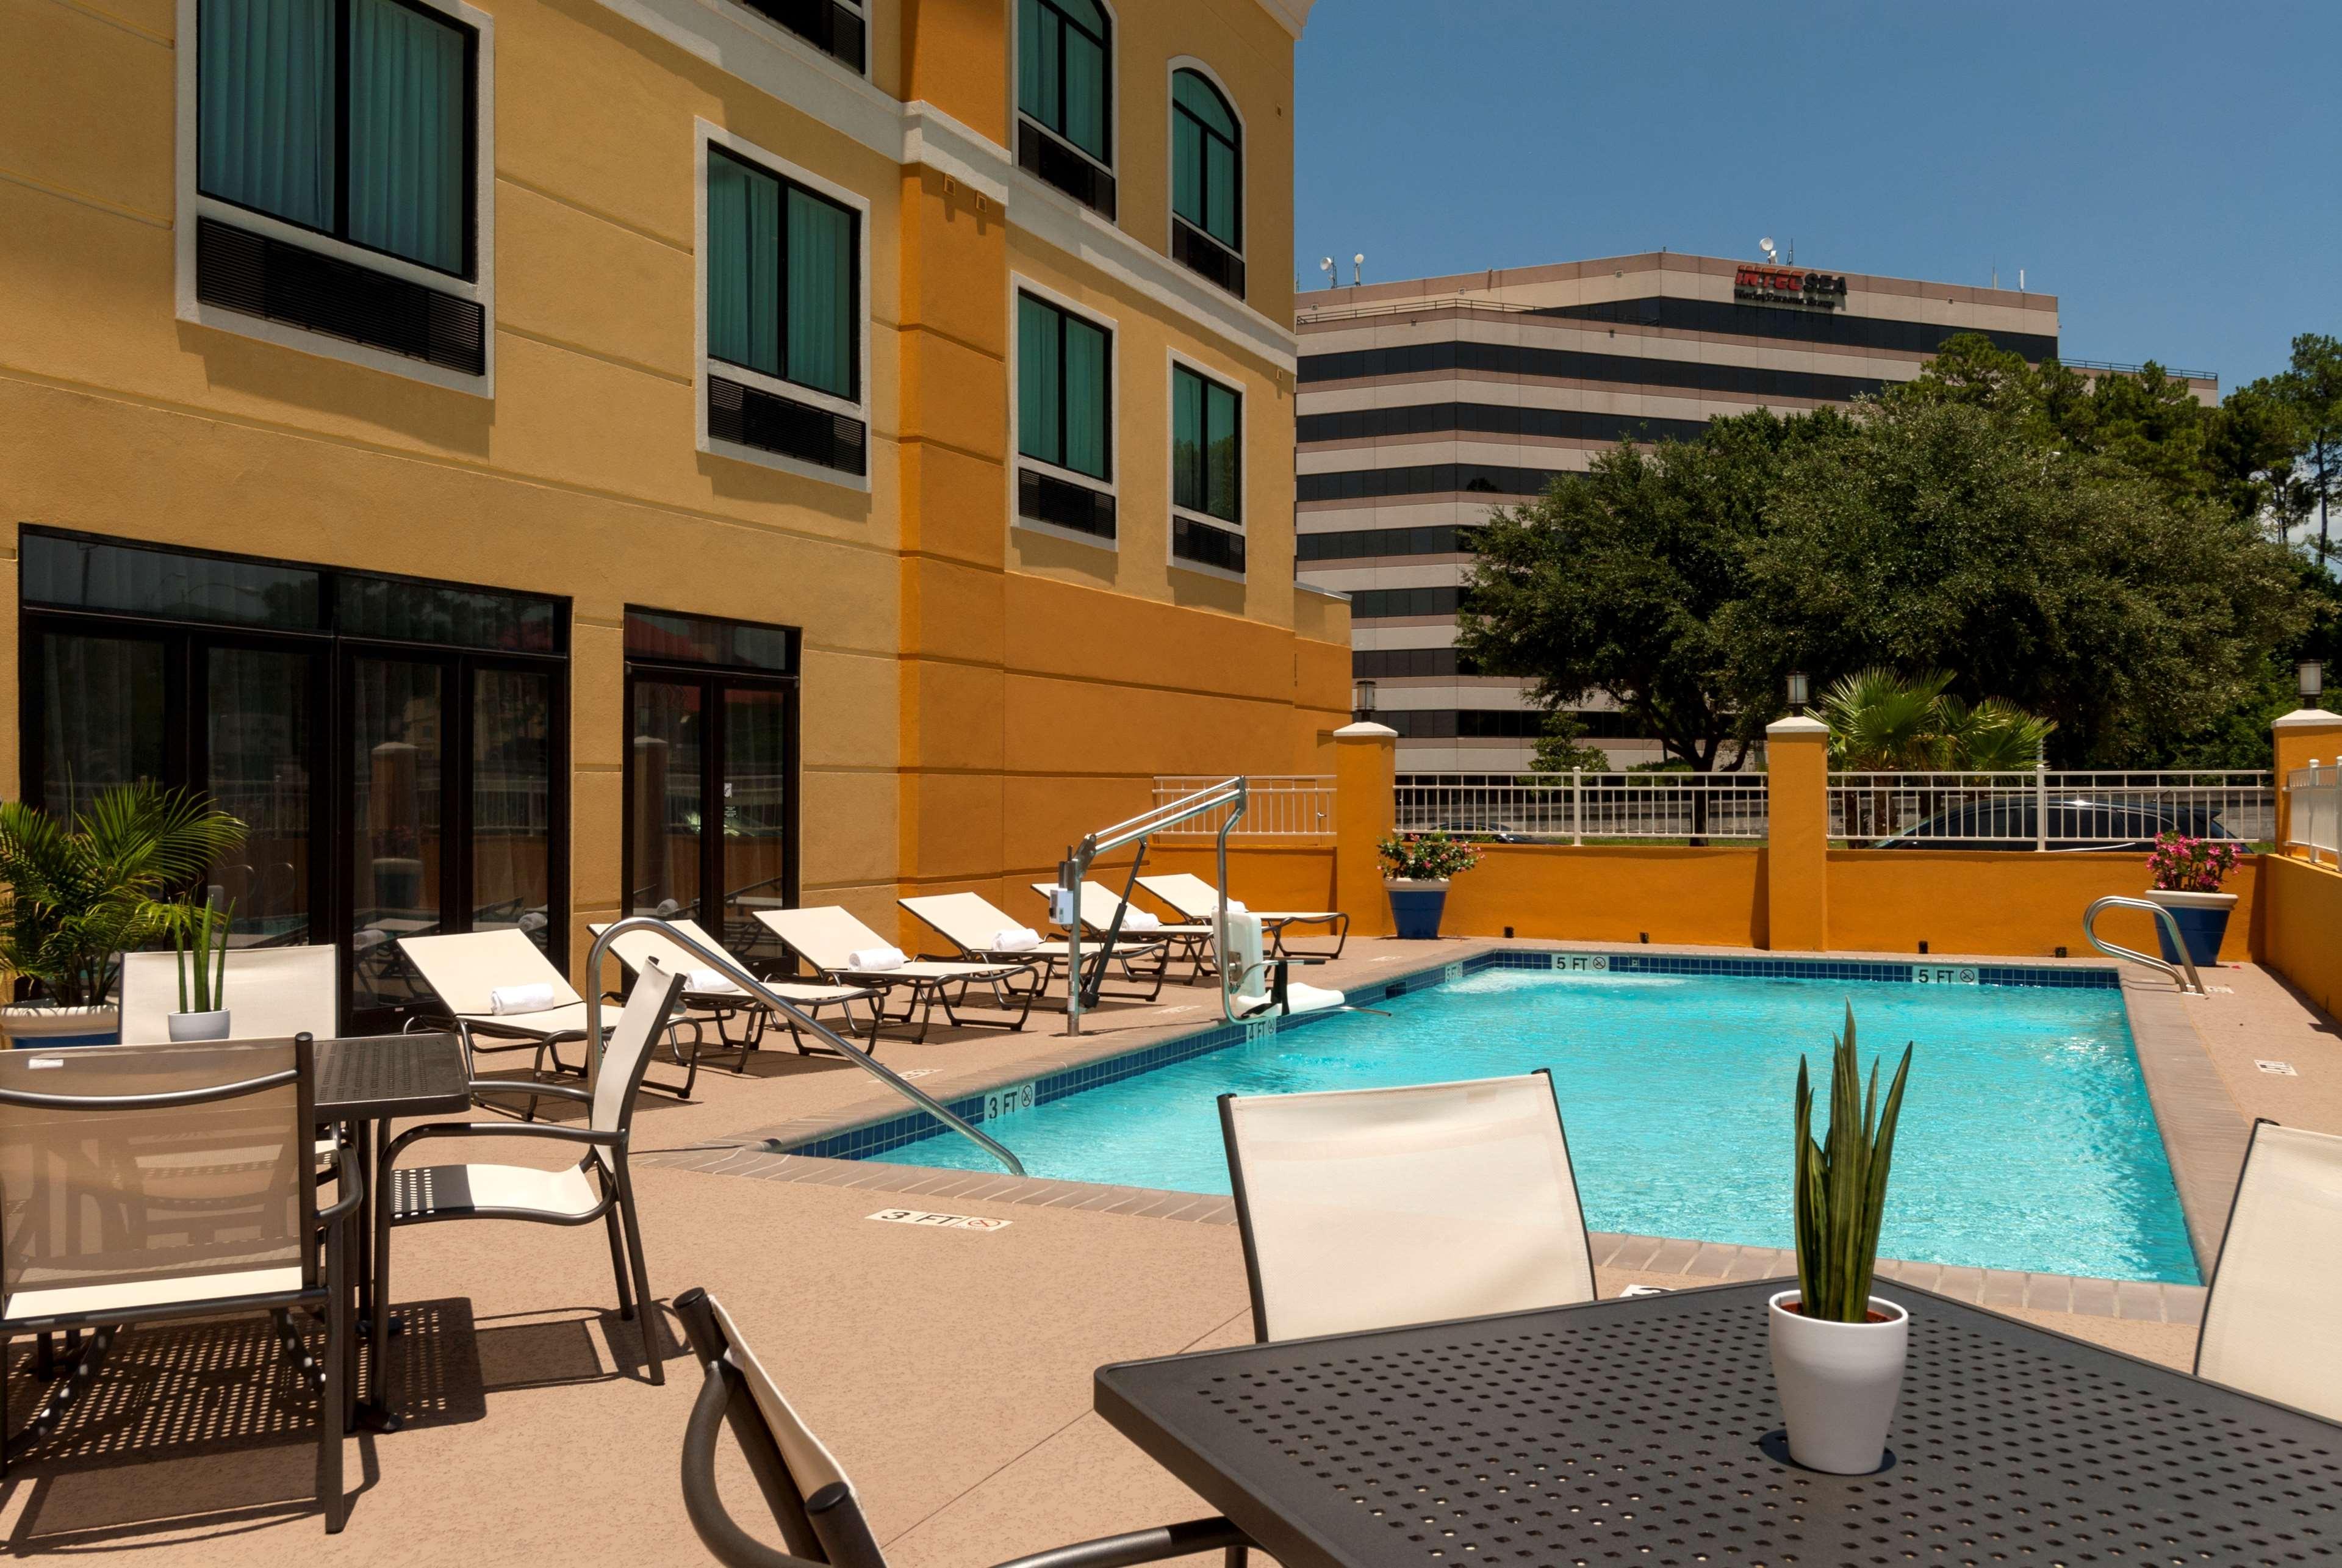 Hotels Near Jfk With Pool